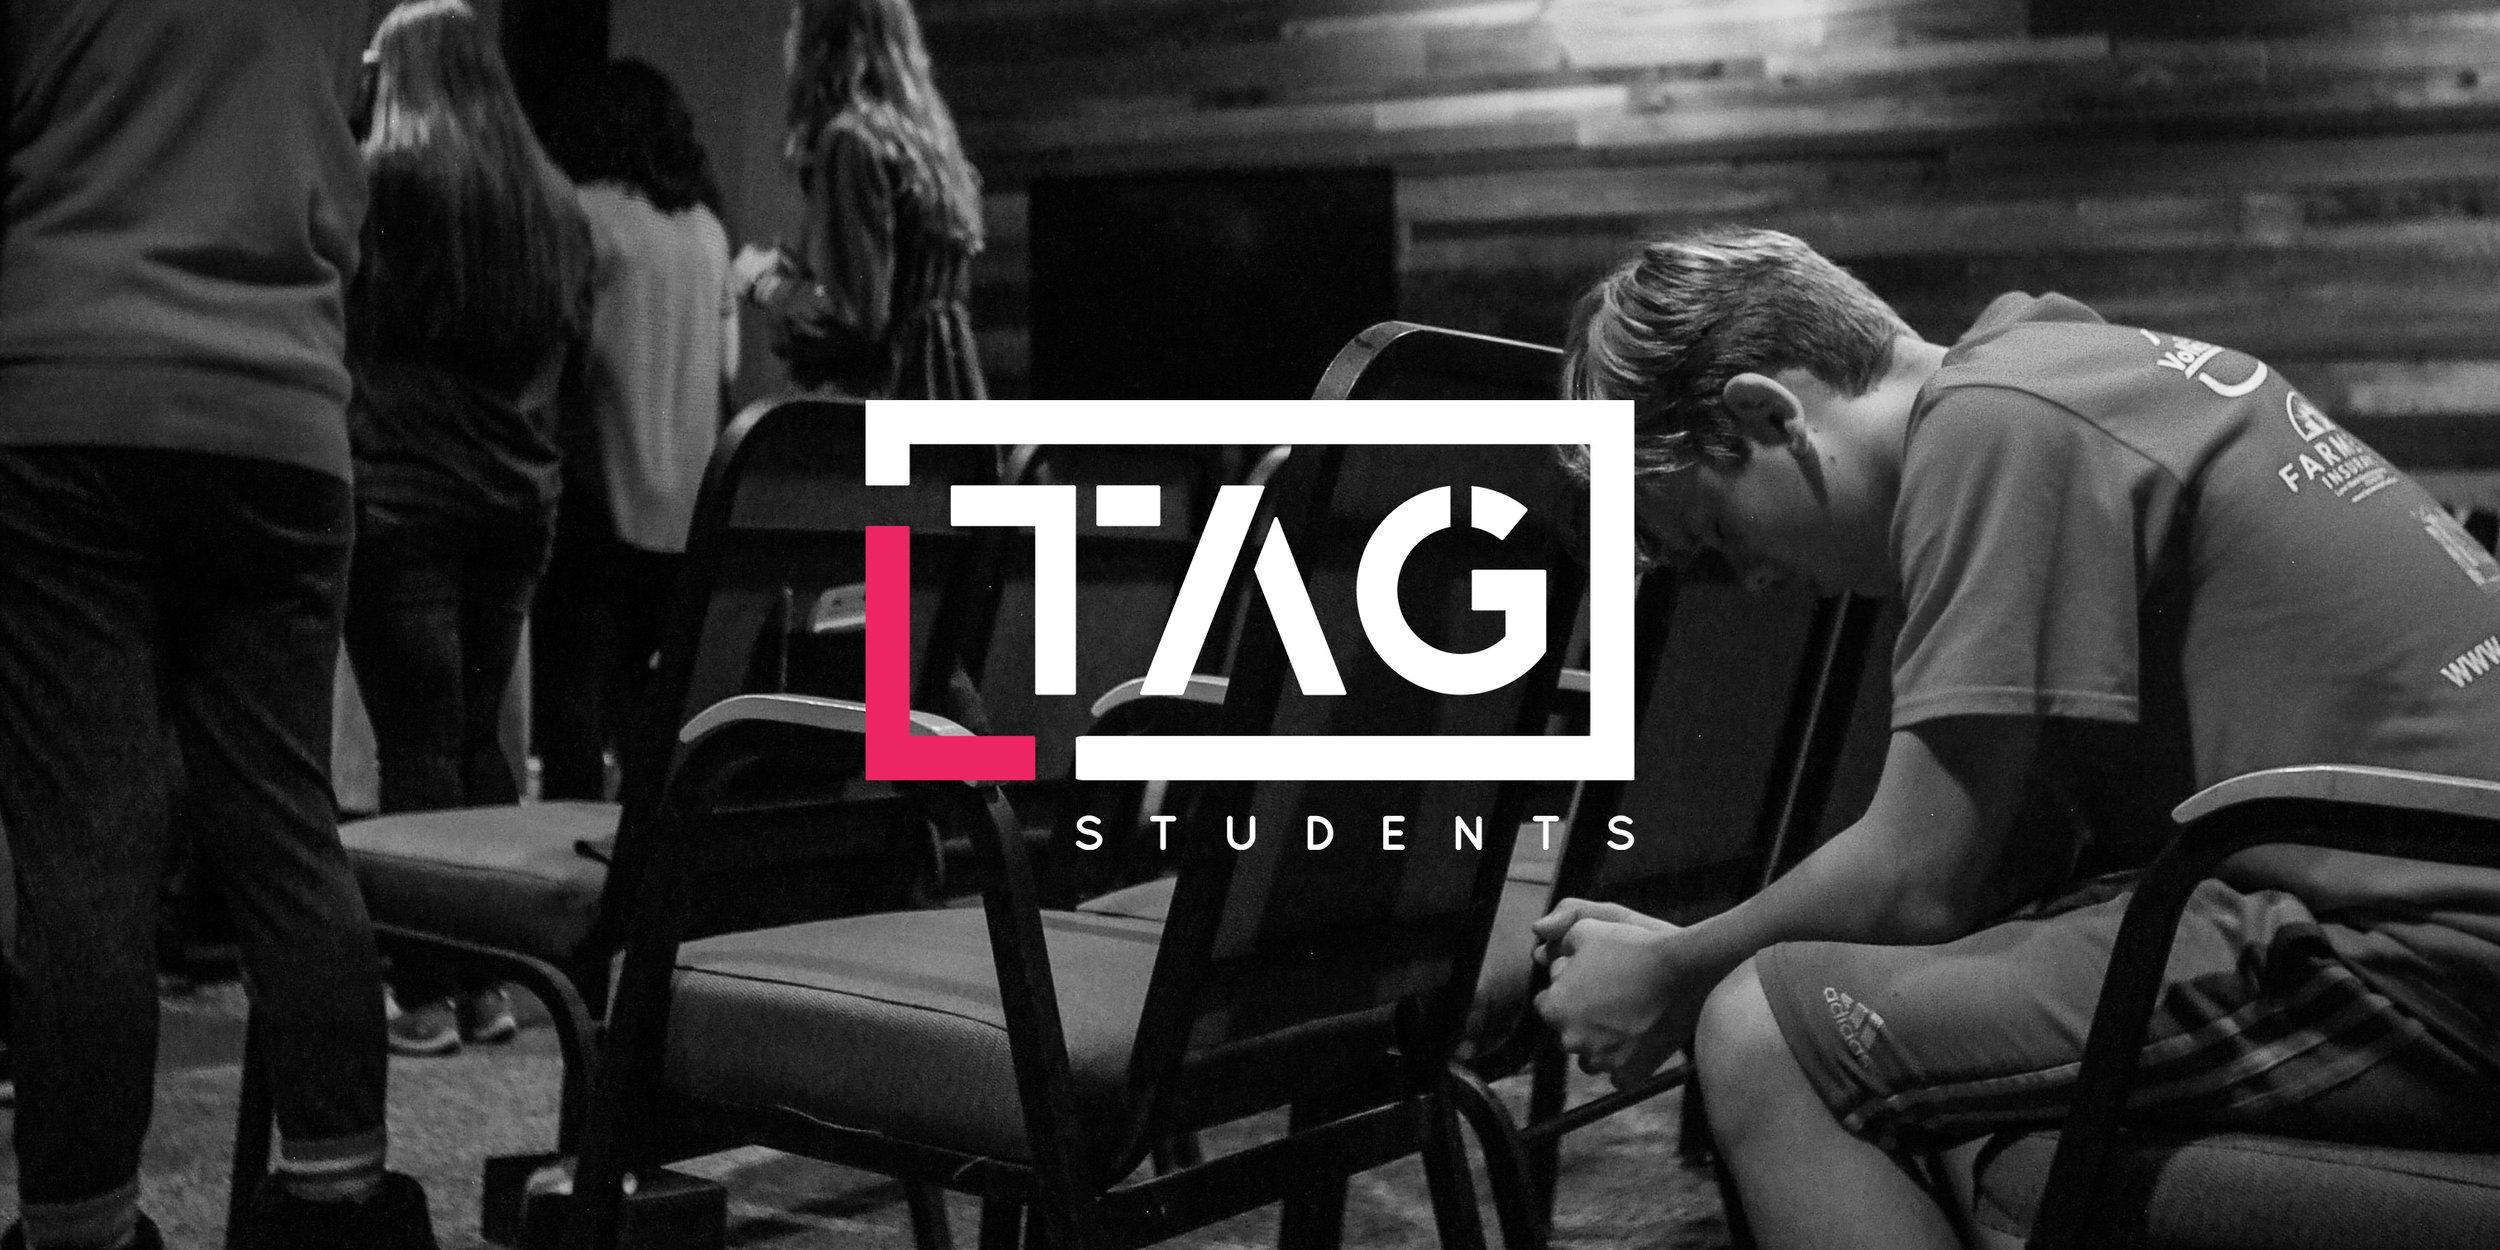 tag-students.jpg